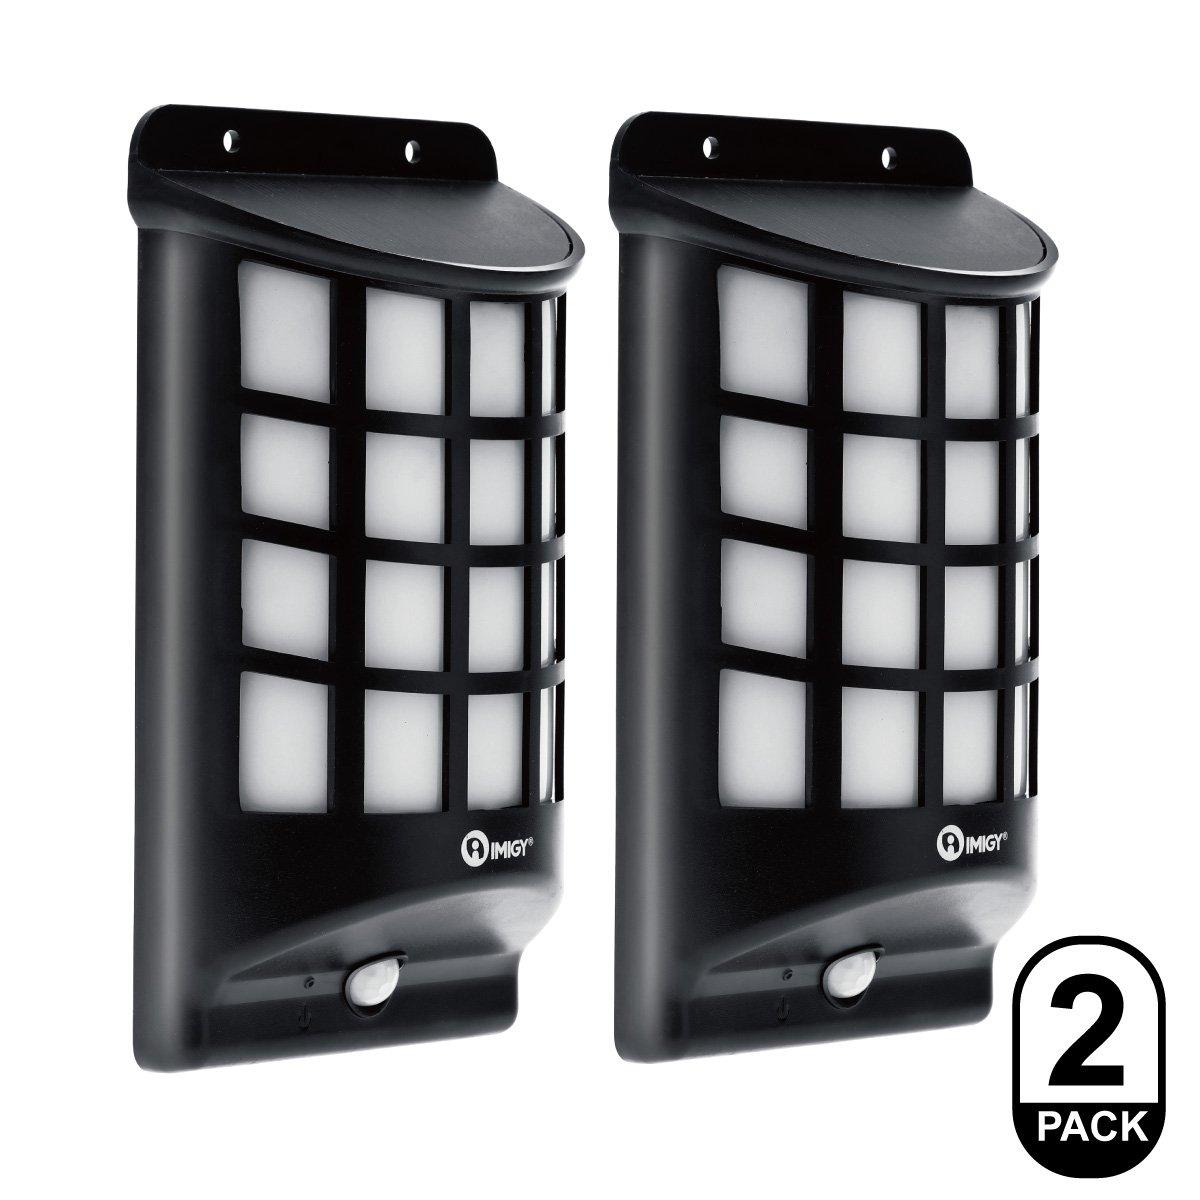 IMIGY Solar Lights, IP65 Waterproof Outdoor Wall Lights, Dark Sensor Auto On/Off Solar Powered Wall Mounted Night Light Lattice Design for Garden Pathway Door Patio Deck Yard Driveway (2 Pack)